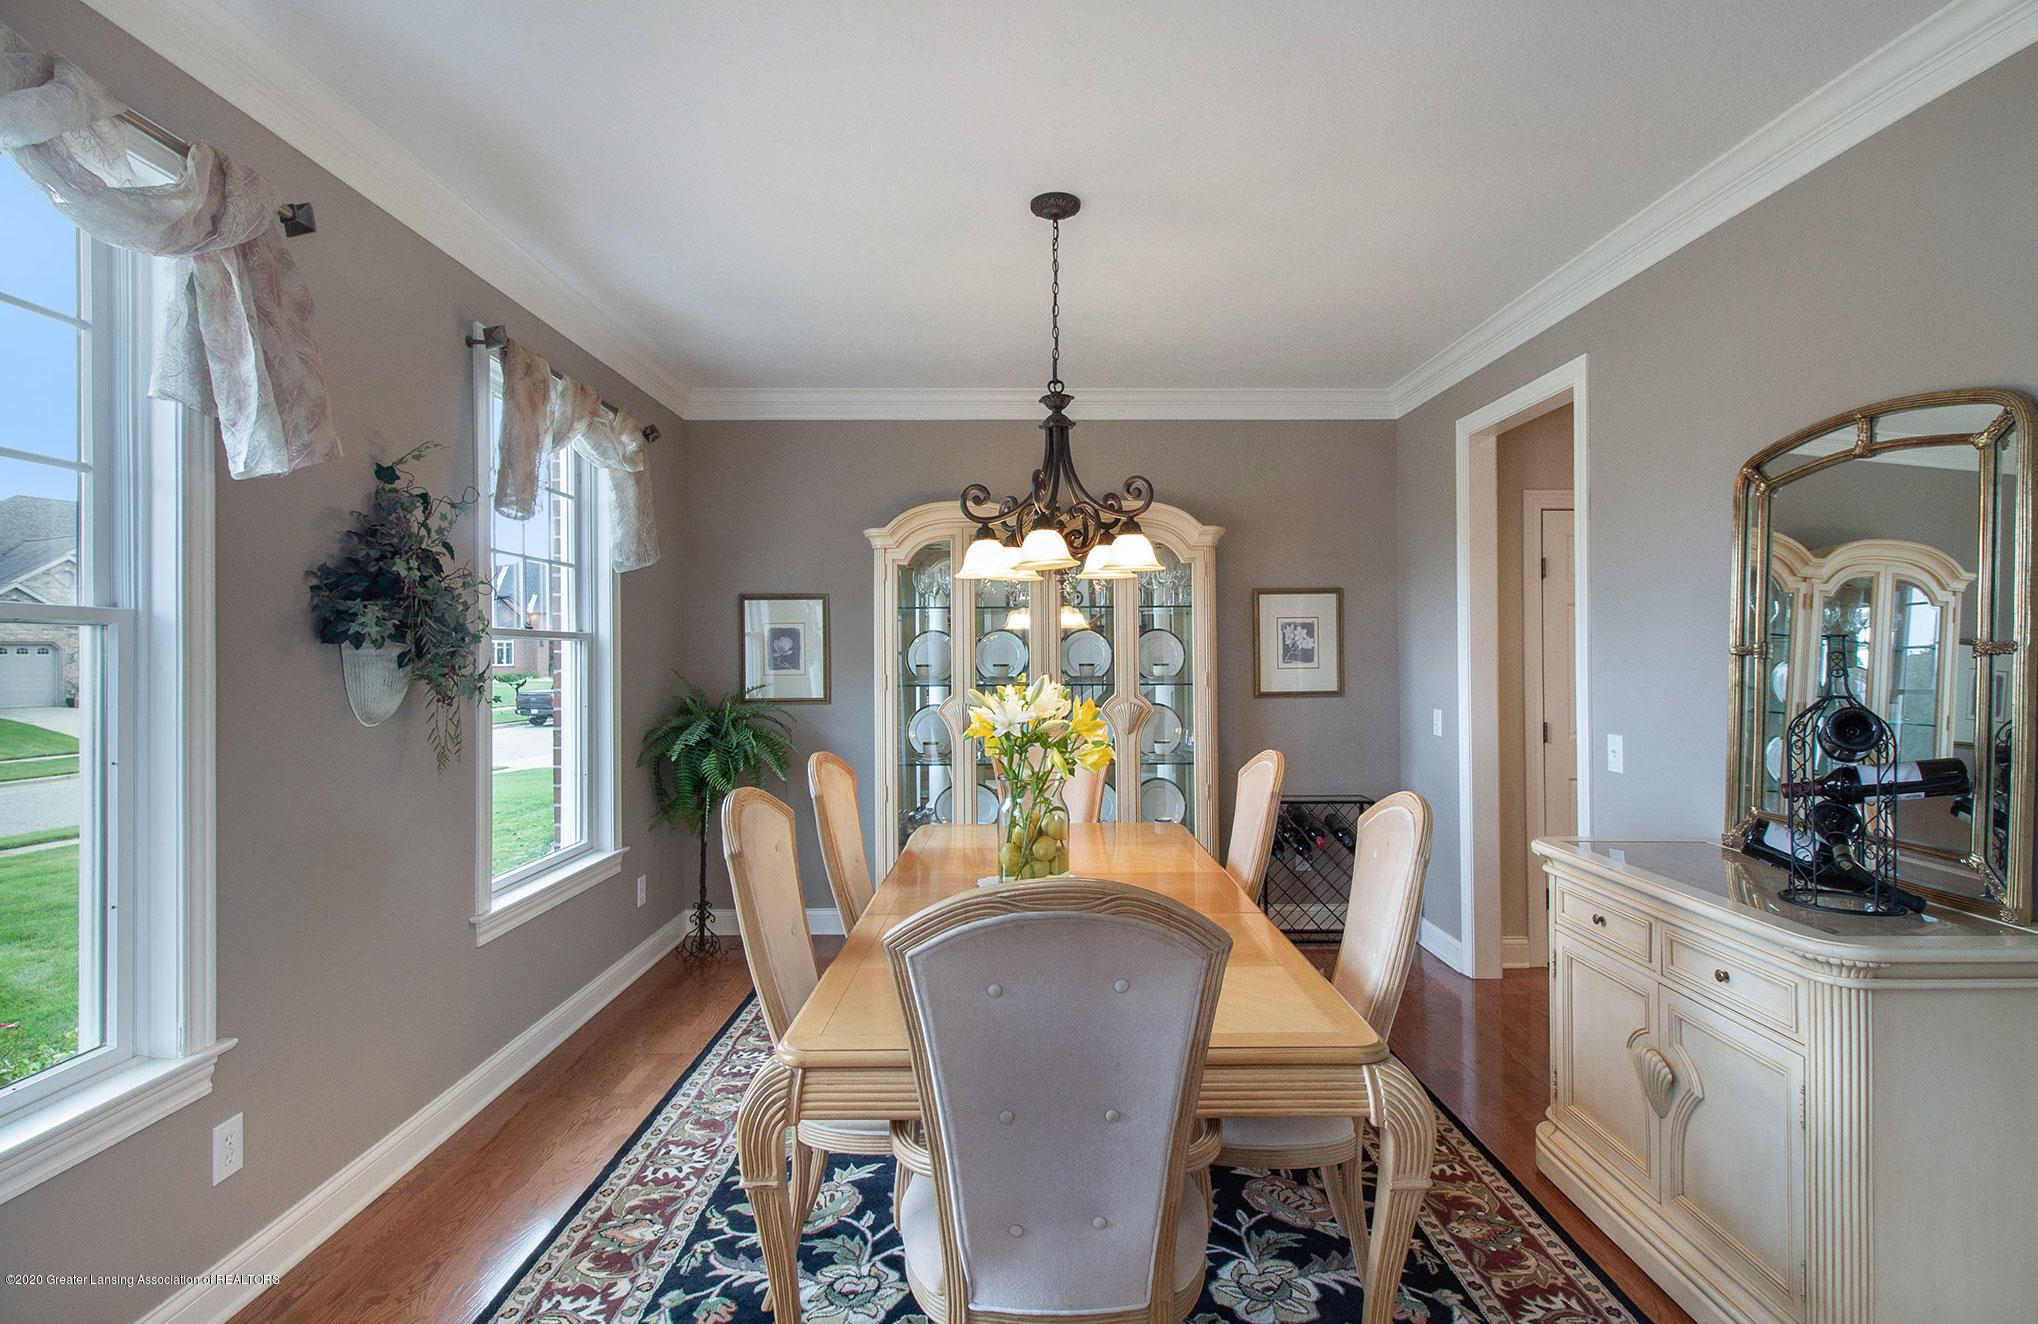 2223 Cawdor Ct - Formal dining room - 12